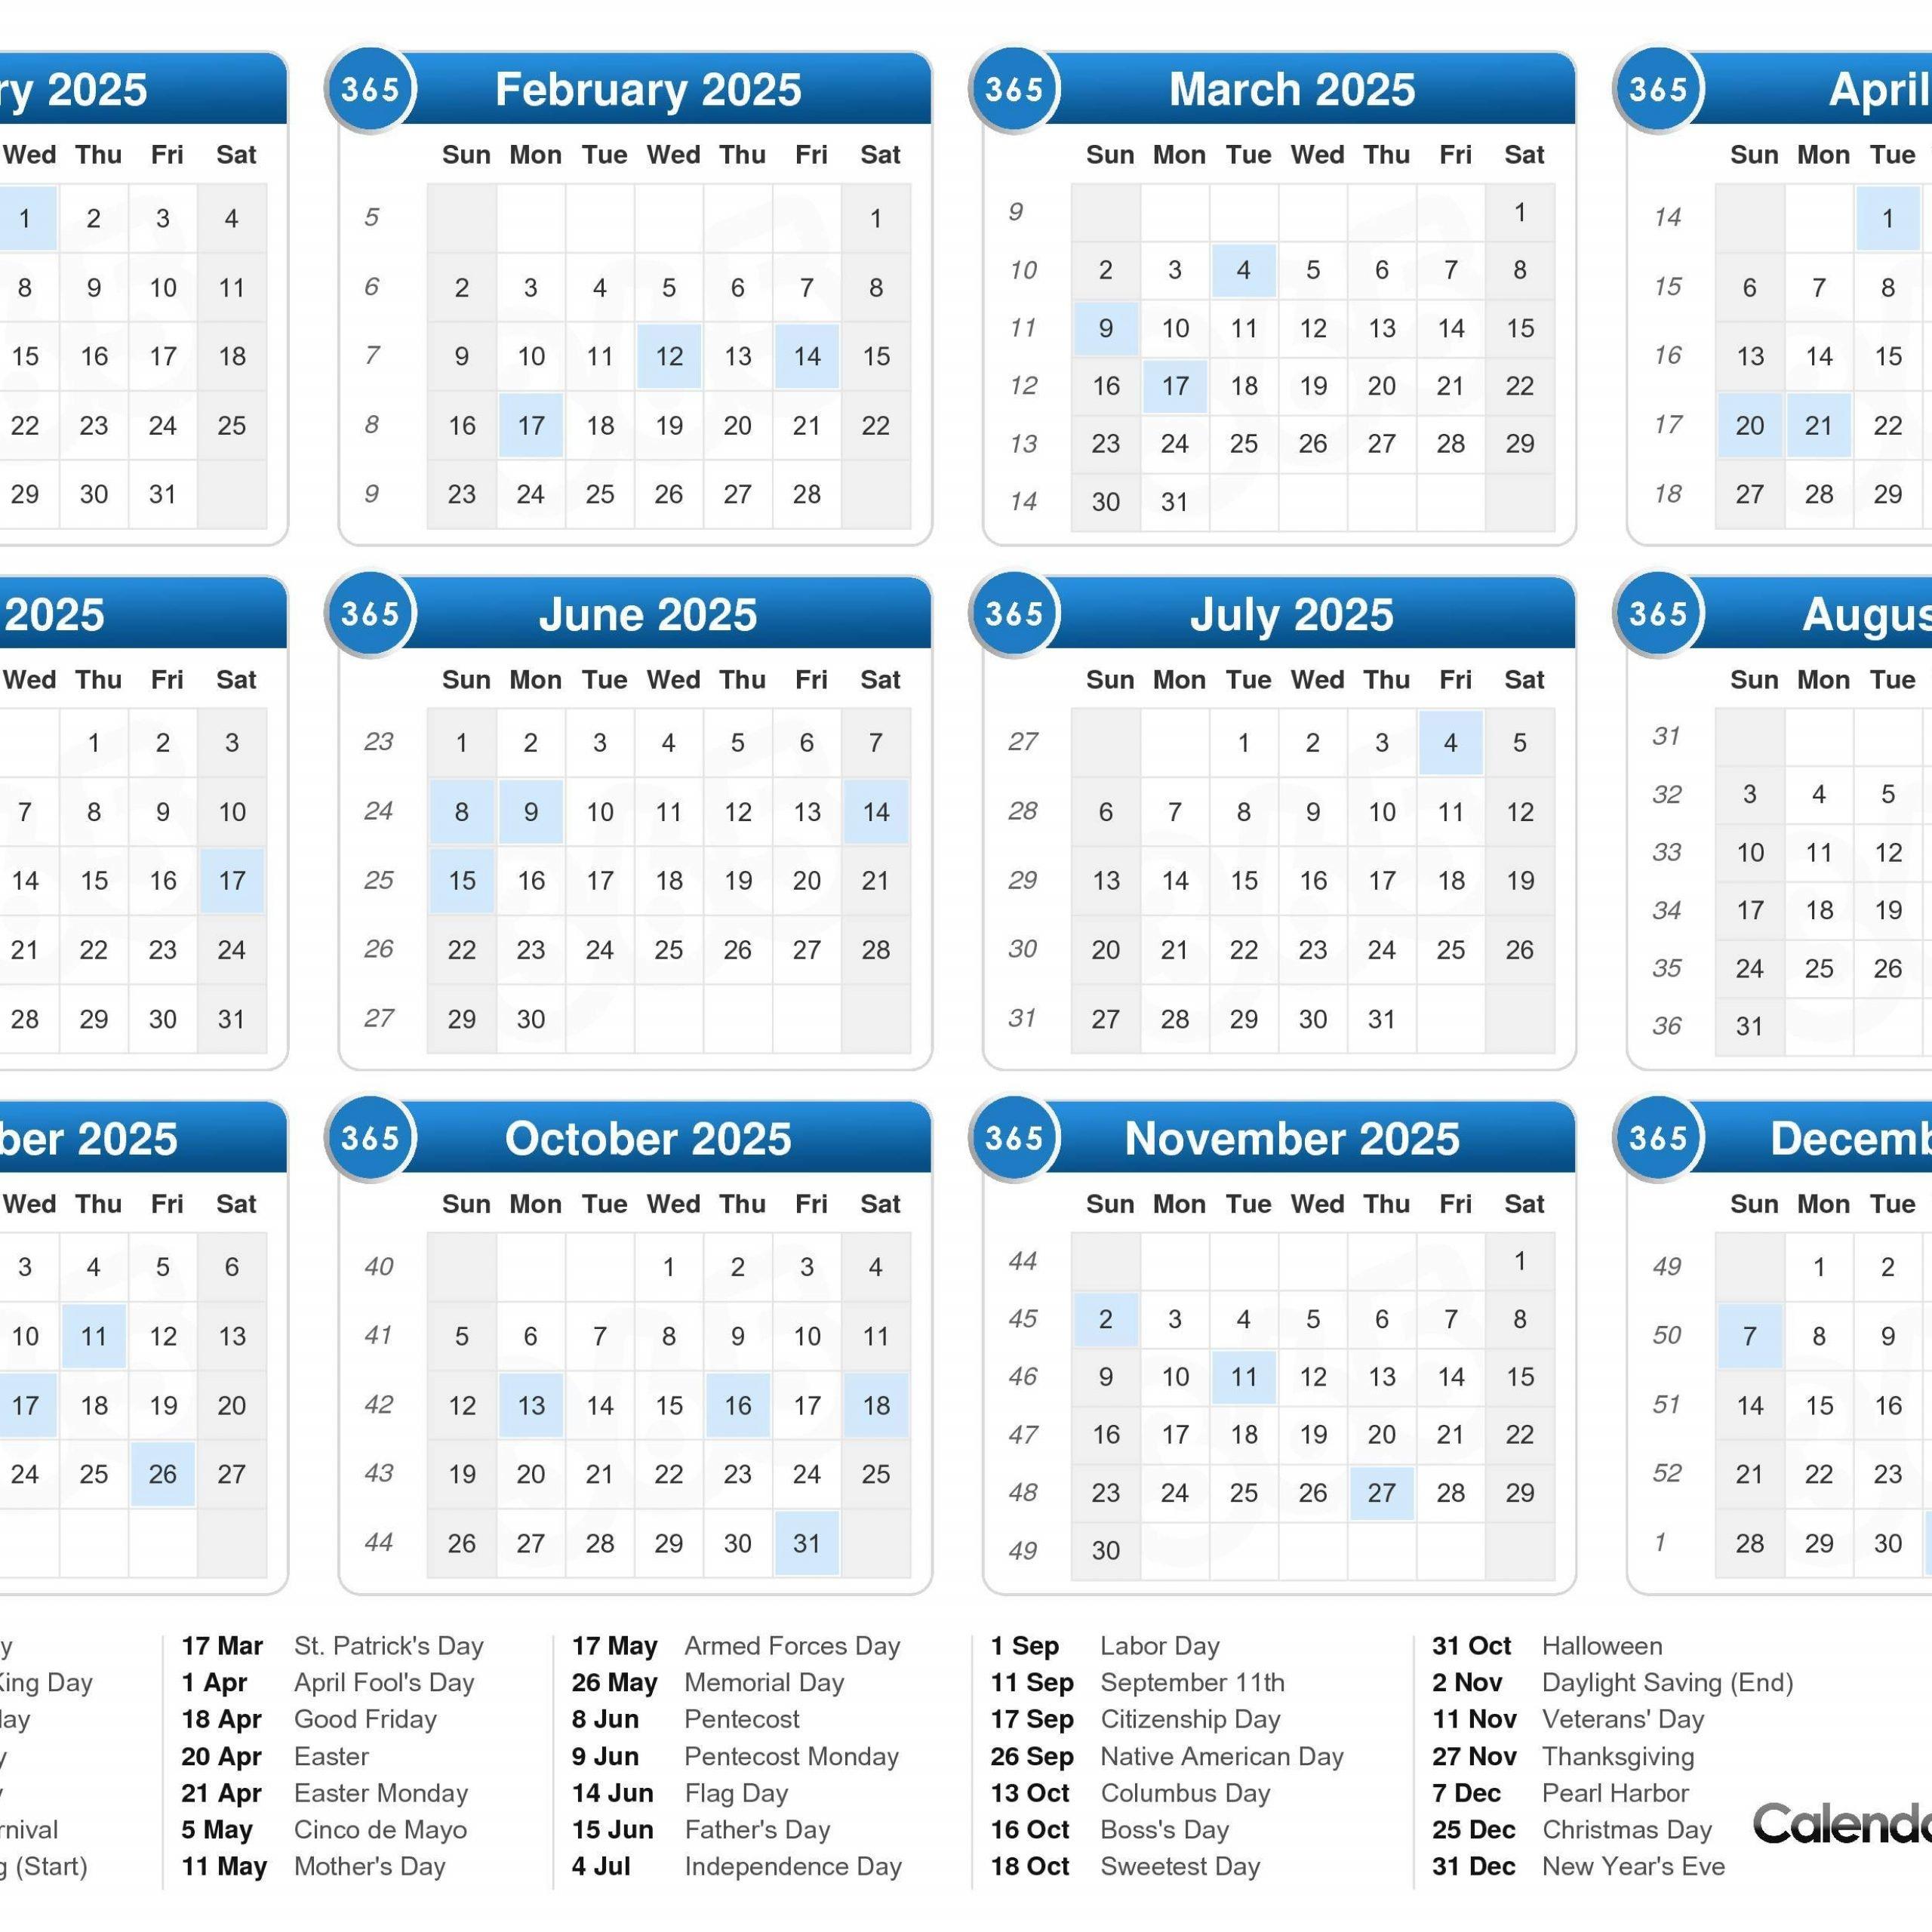 5 Year Calendar 2020 To 2025 | Free Printable Calendar Free Printable 5 Year Calendar